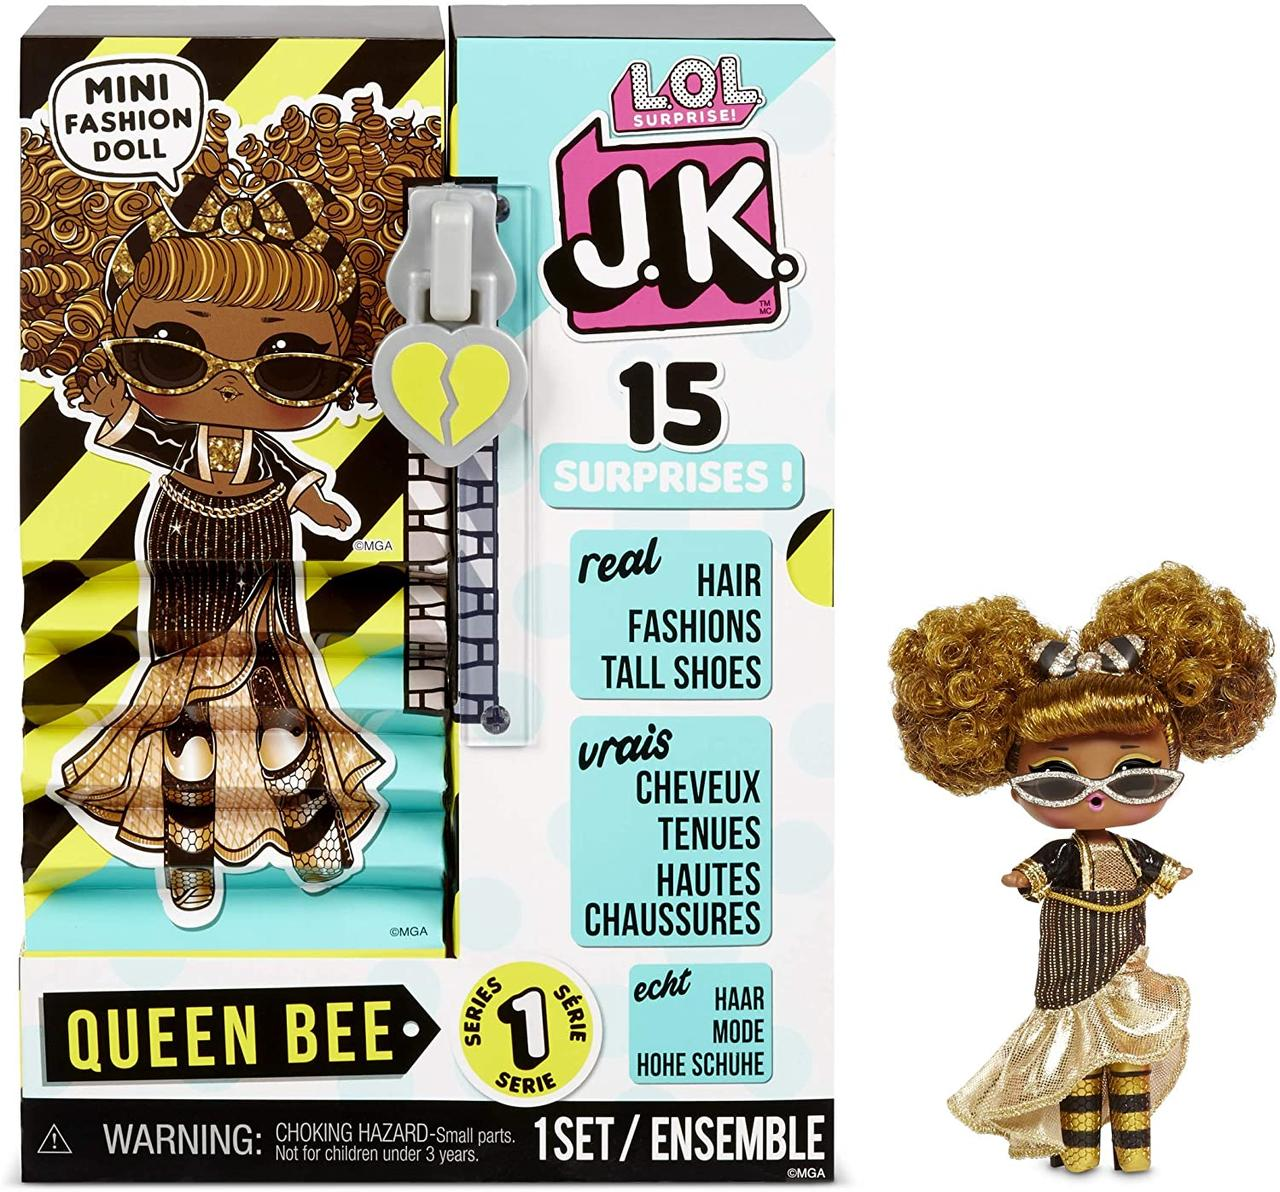 LOL Surprise J.K. Мини Модная Кукла Куин Би (Queen Bee), 1 серия, ЛОЛ Сюрприз